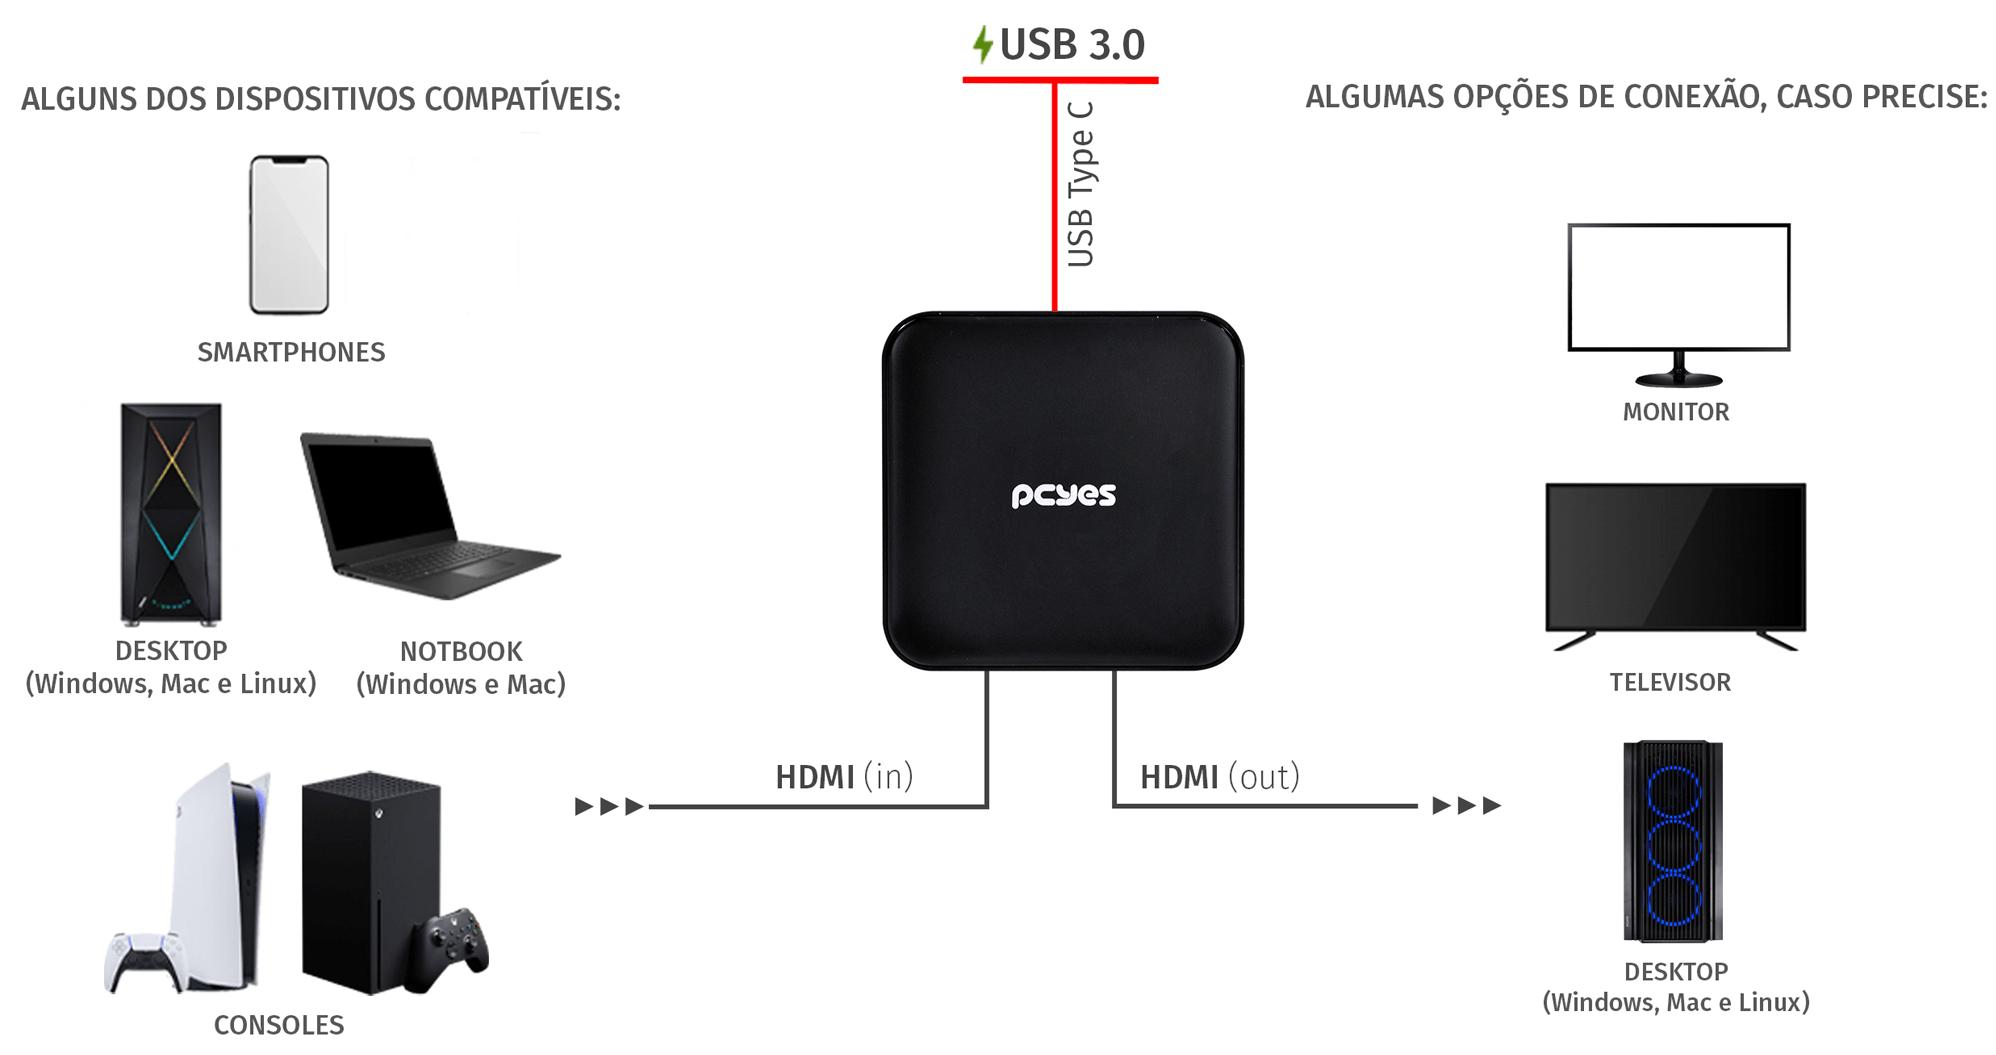 conexao placa de captura portatil lynx uhd 01s pcyes 2